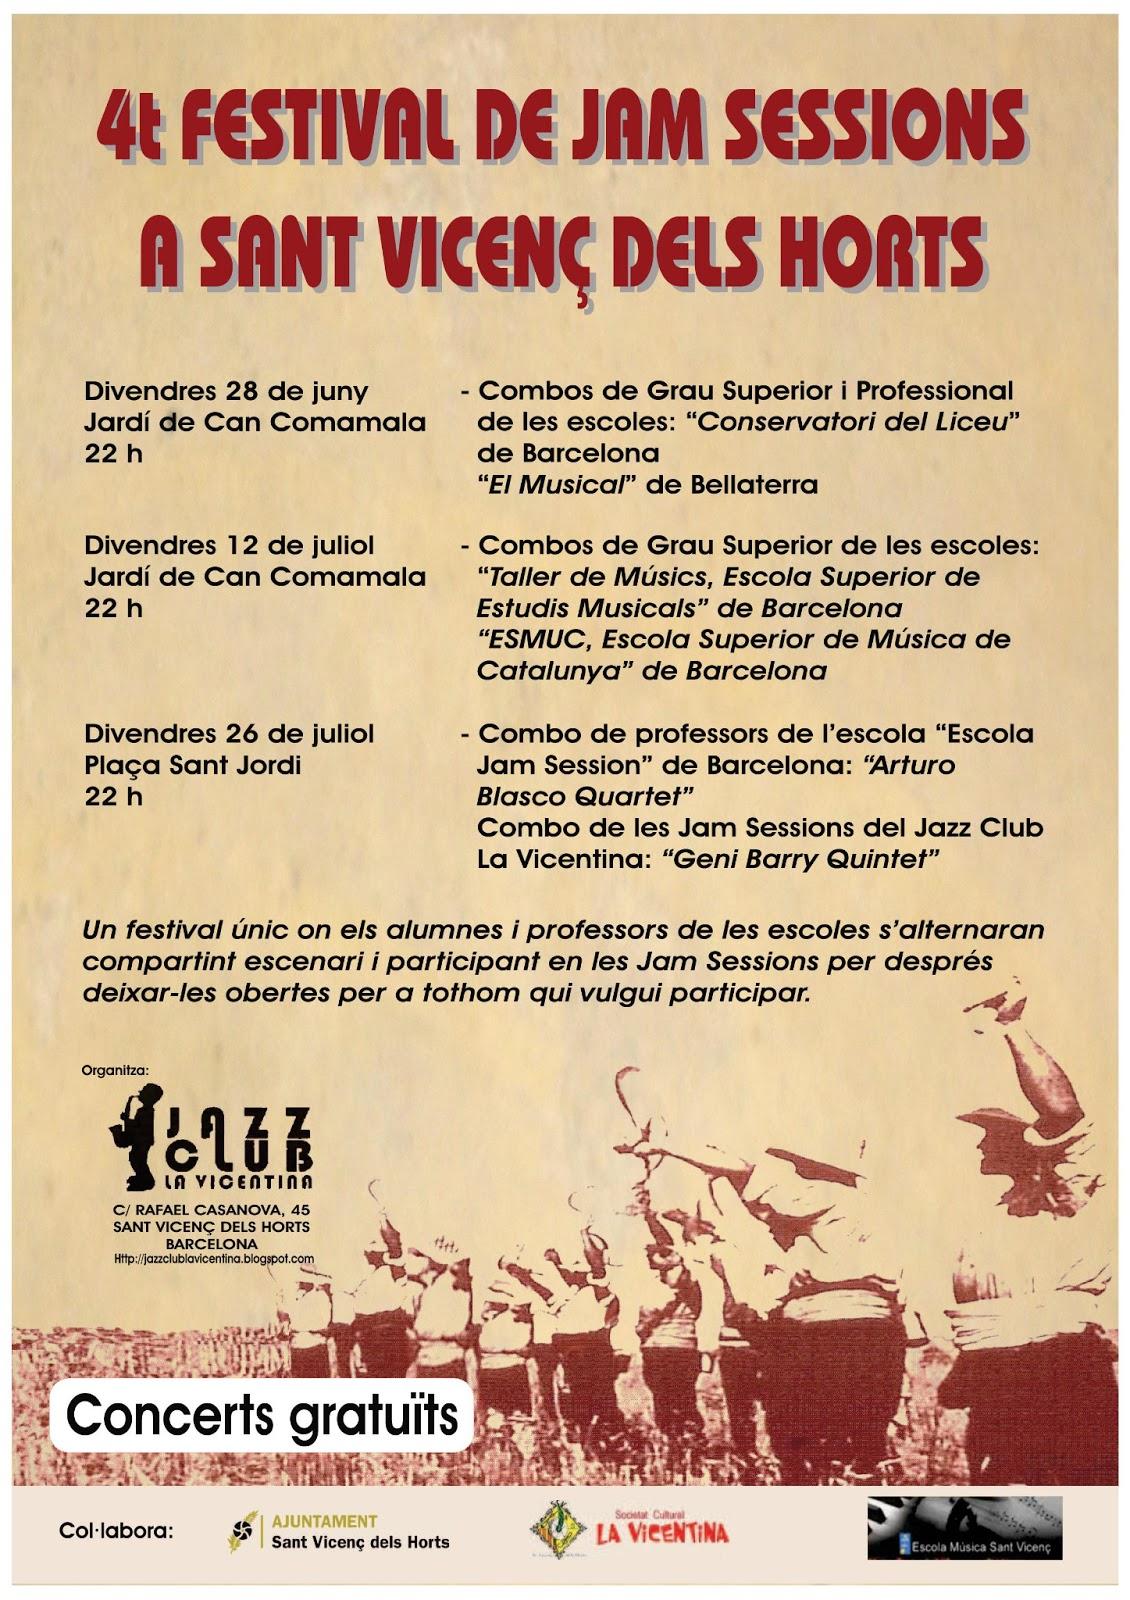 4rt FESTIVAL DE JAM SESSIONS a Sant Vicenç dels Horts